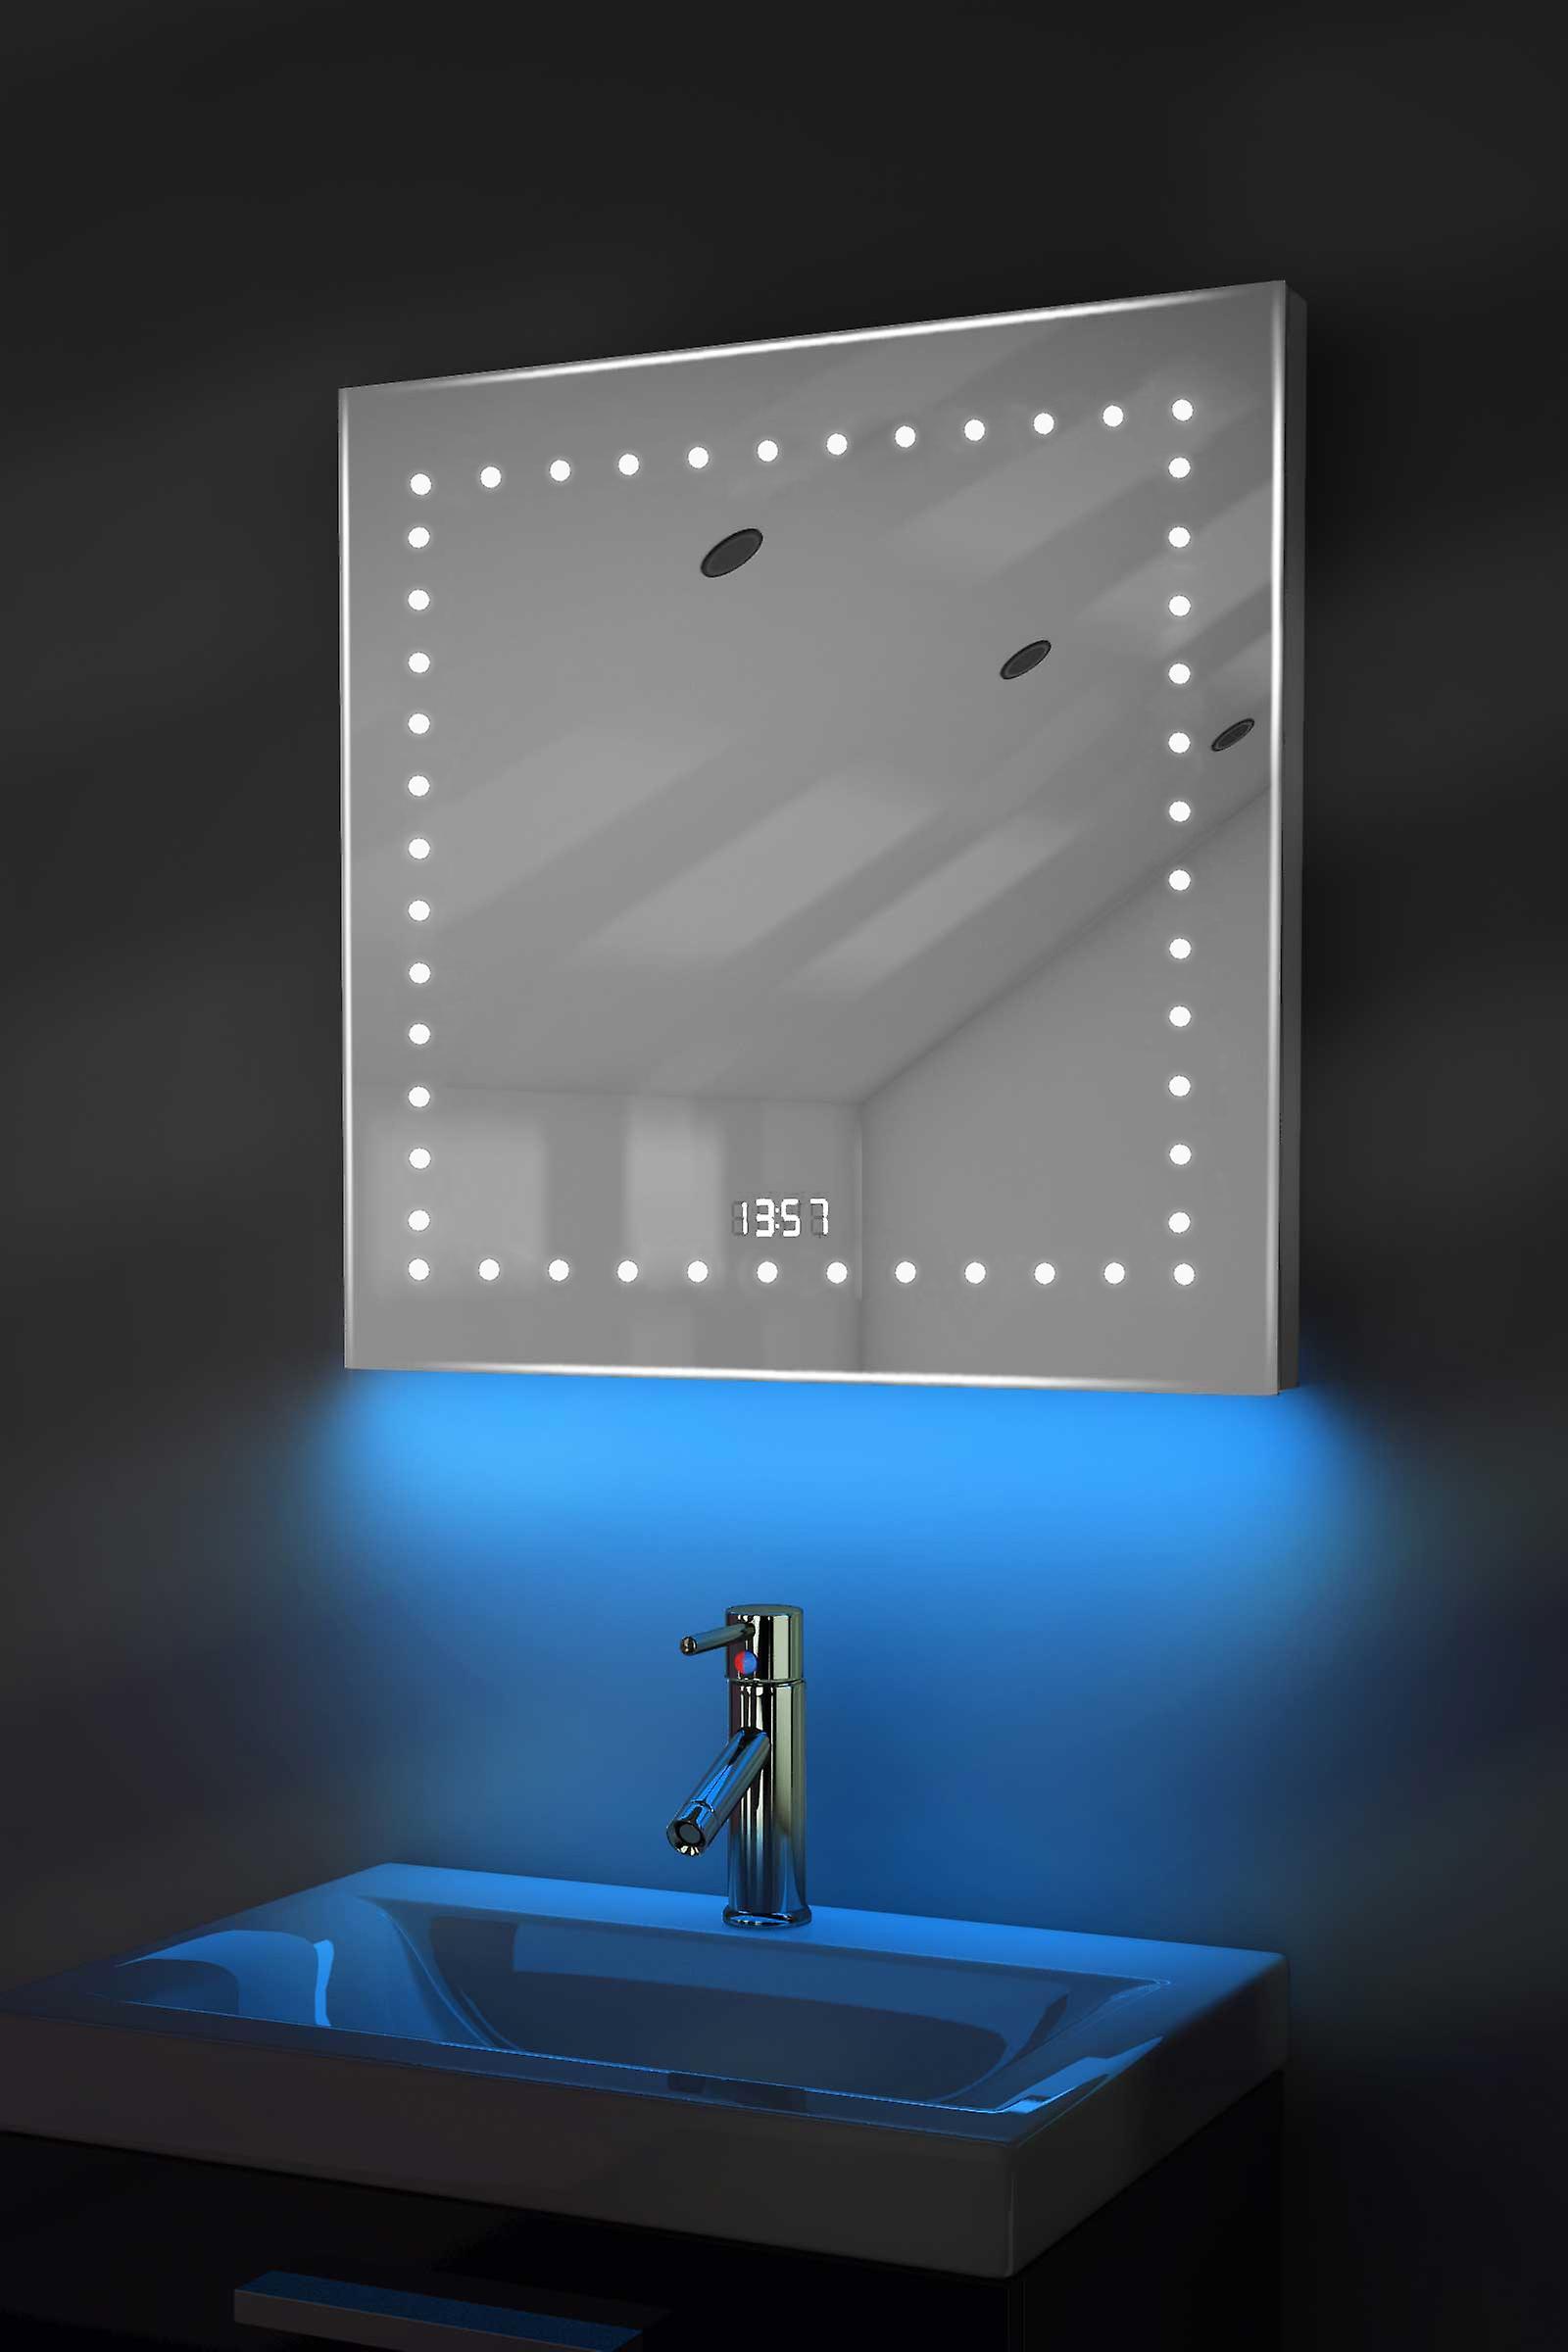 Digital Clock Shaver Mirror with RGB Lighting, Demist & Sensor k183rgb